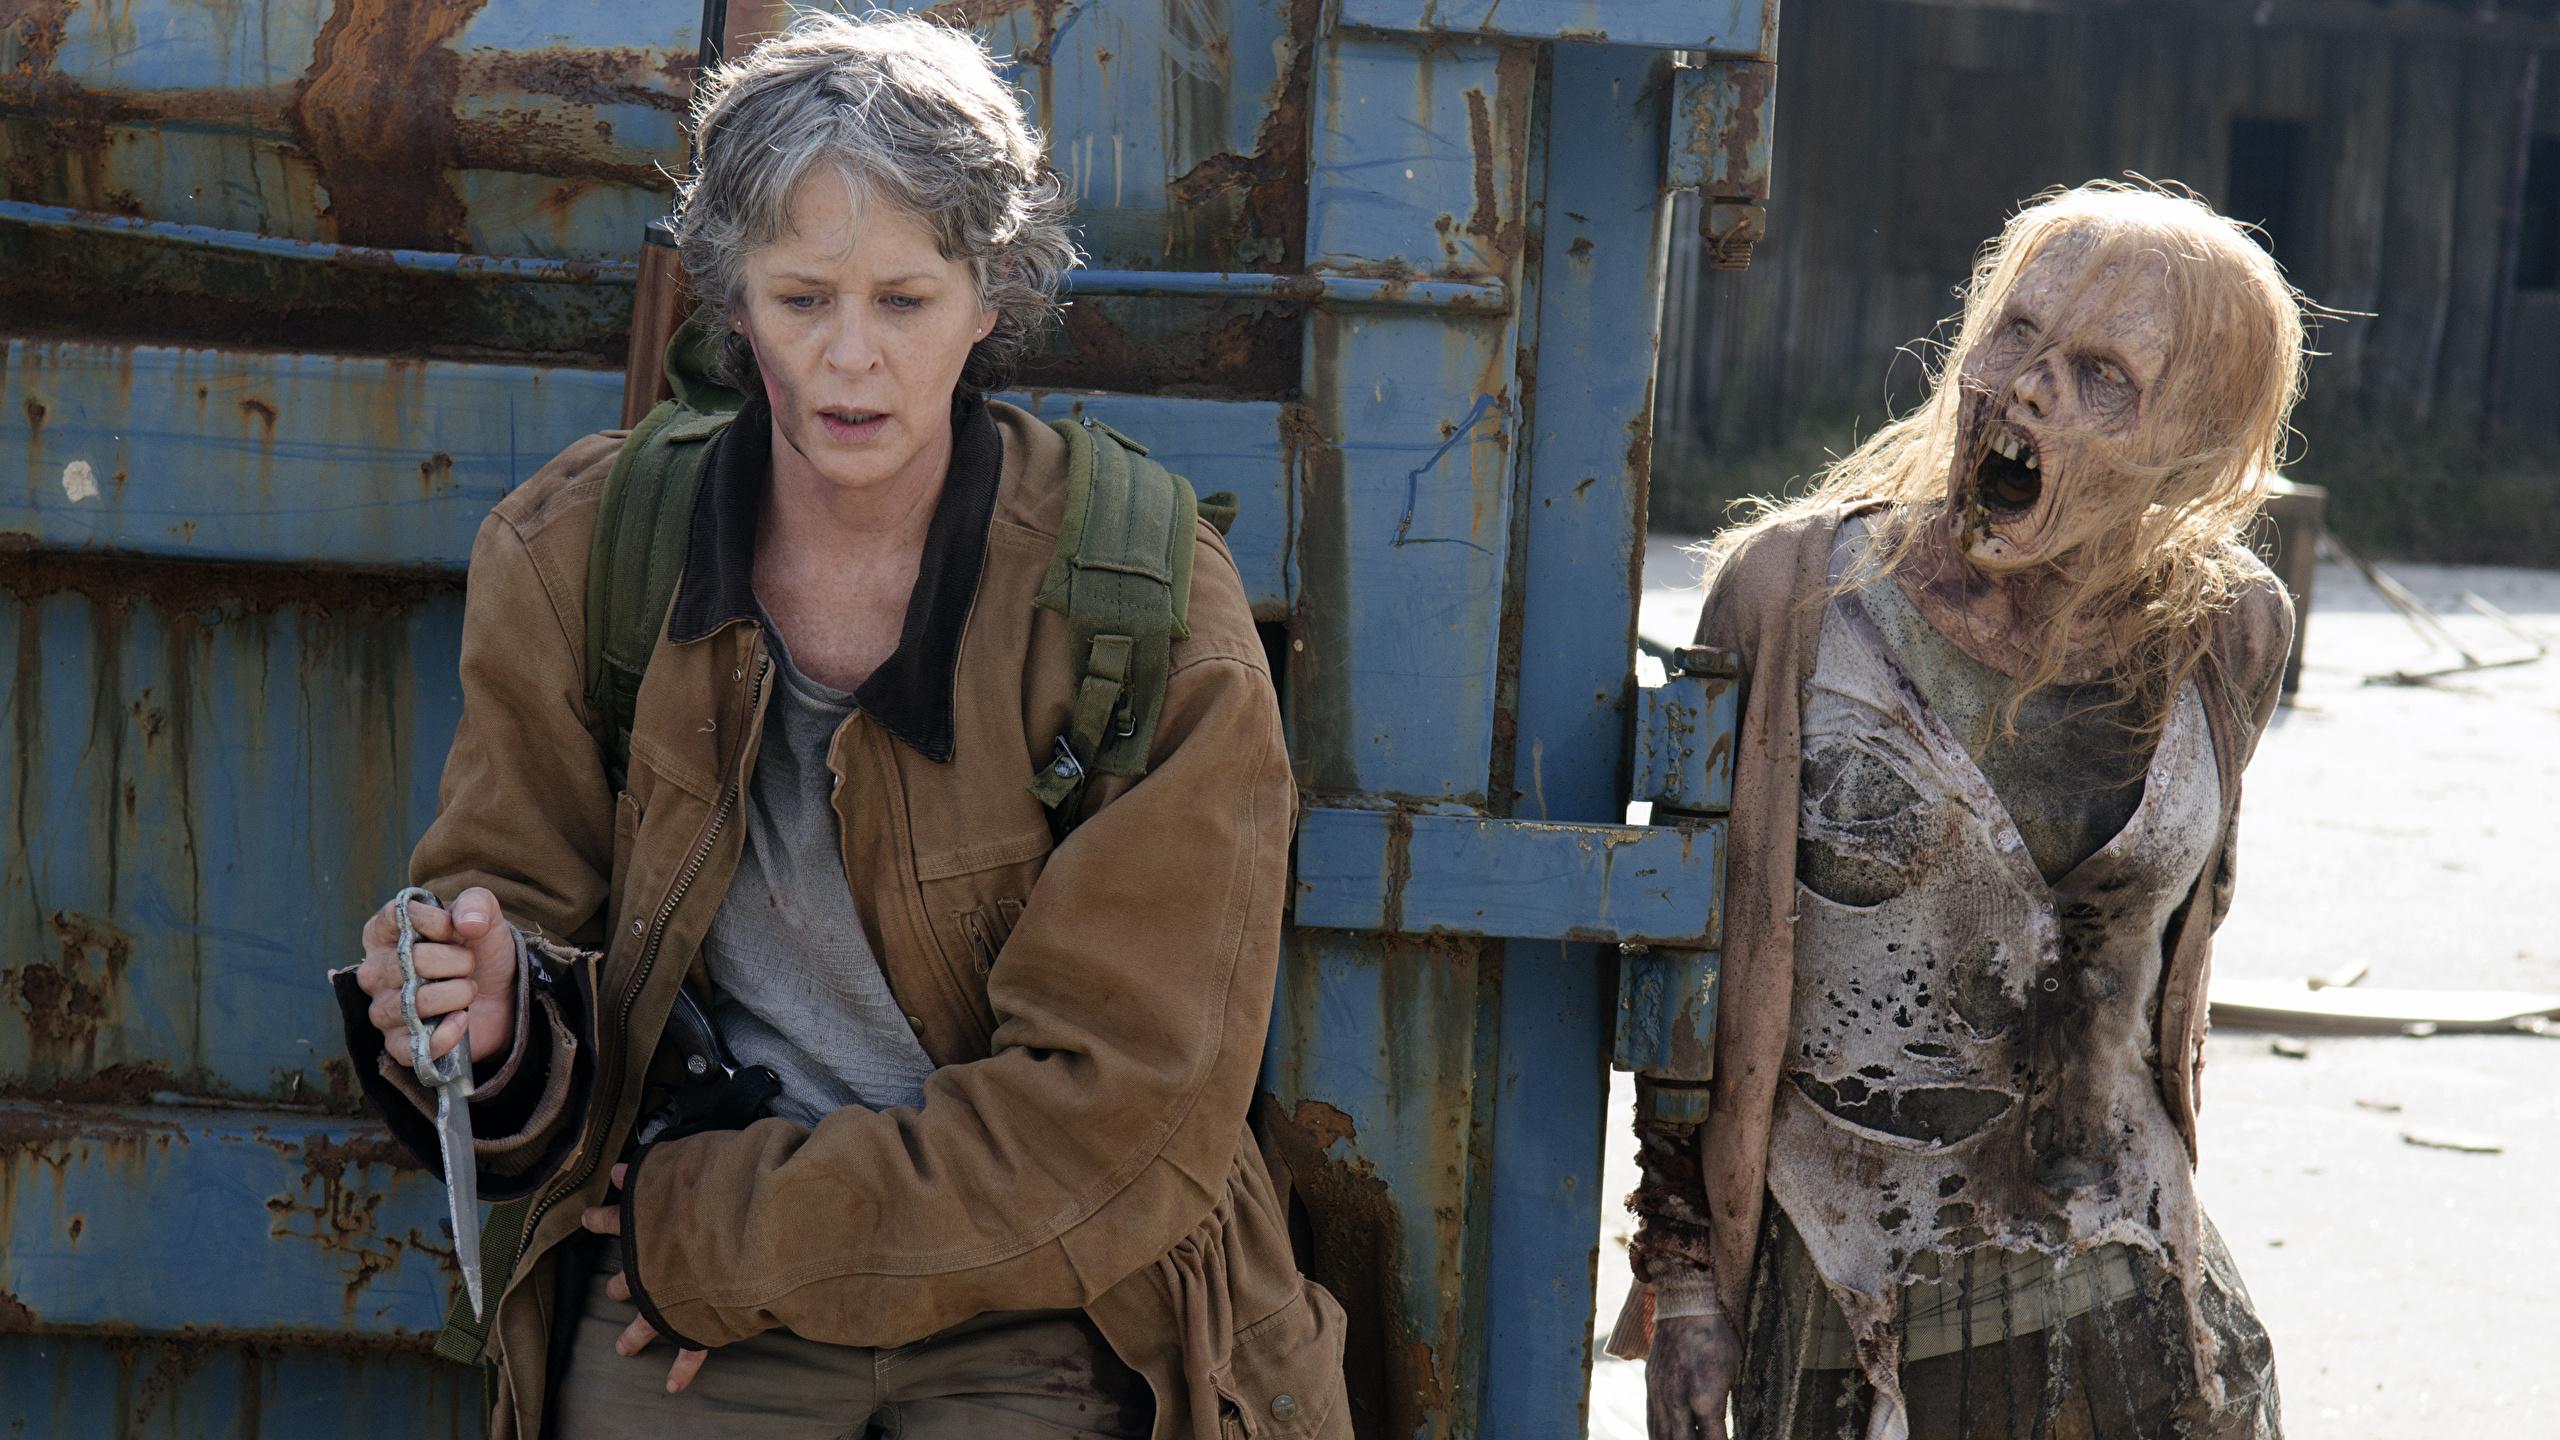 Image The Walking Dead Tv Zombie Melissa Mcbride Season 6 2560x1440